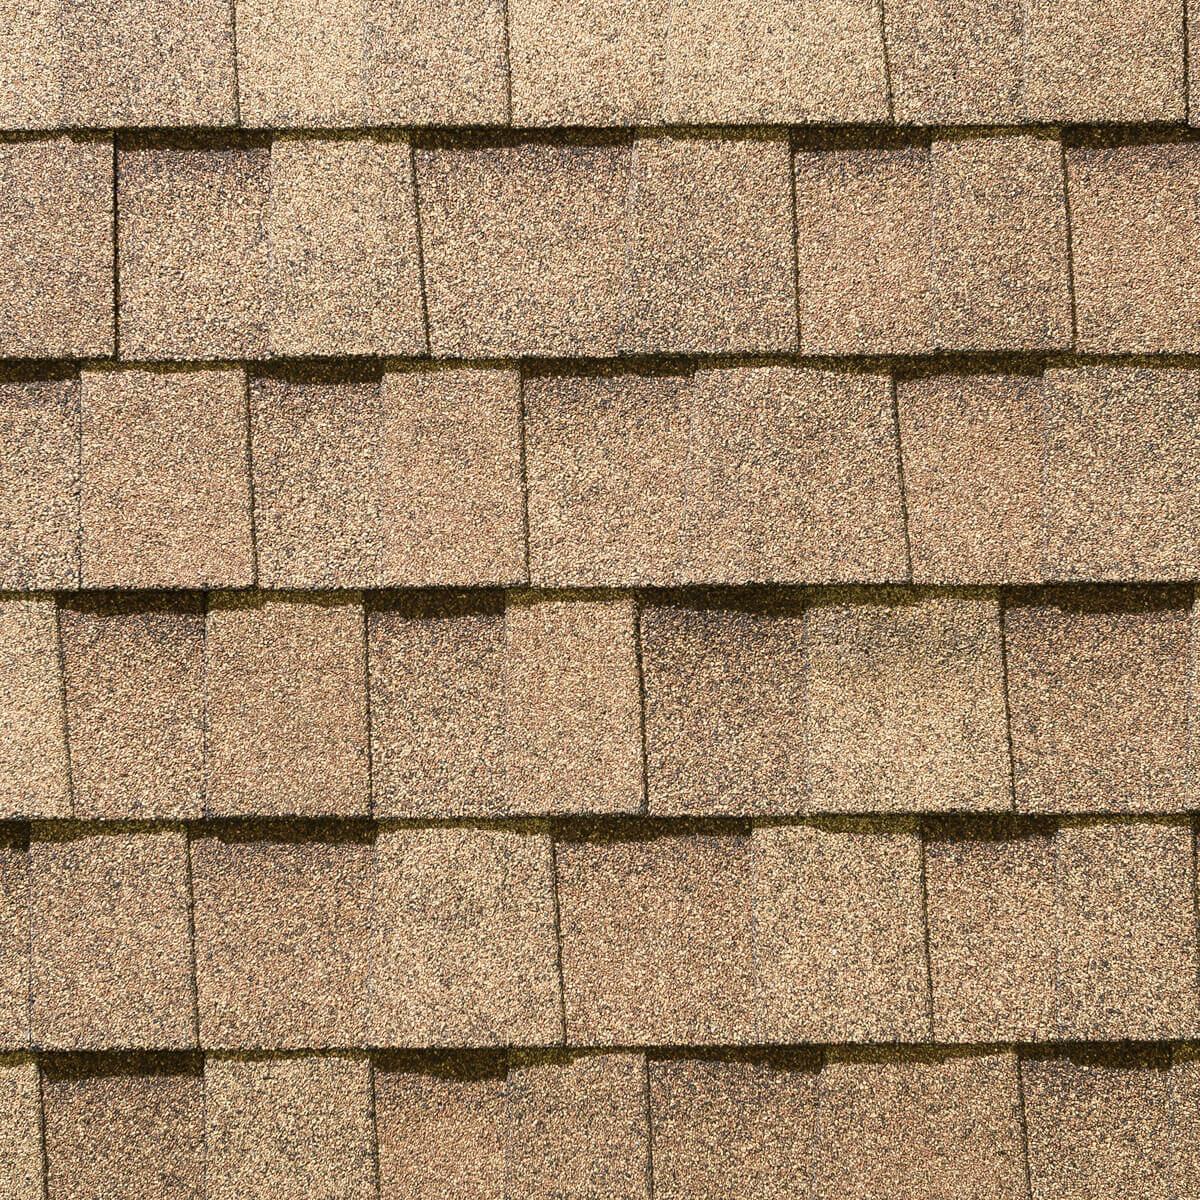 Mystique Laminated Roofing Shingles - Sunset Cedar